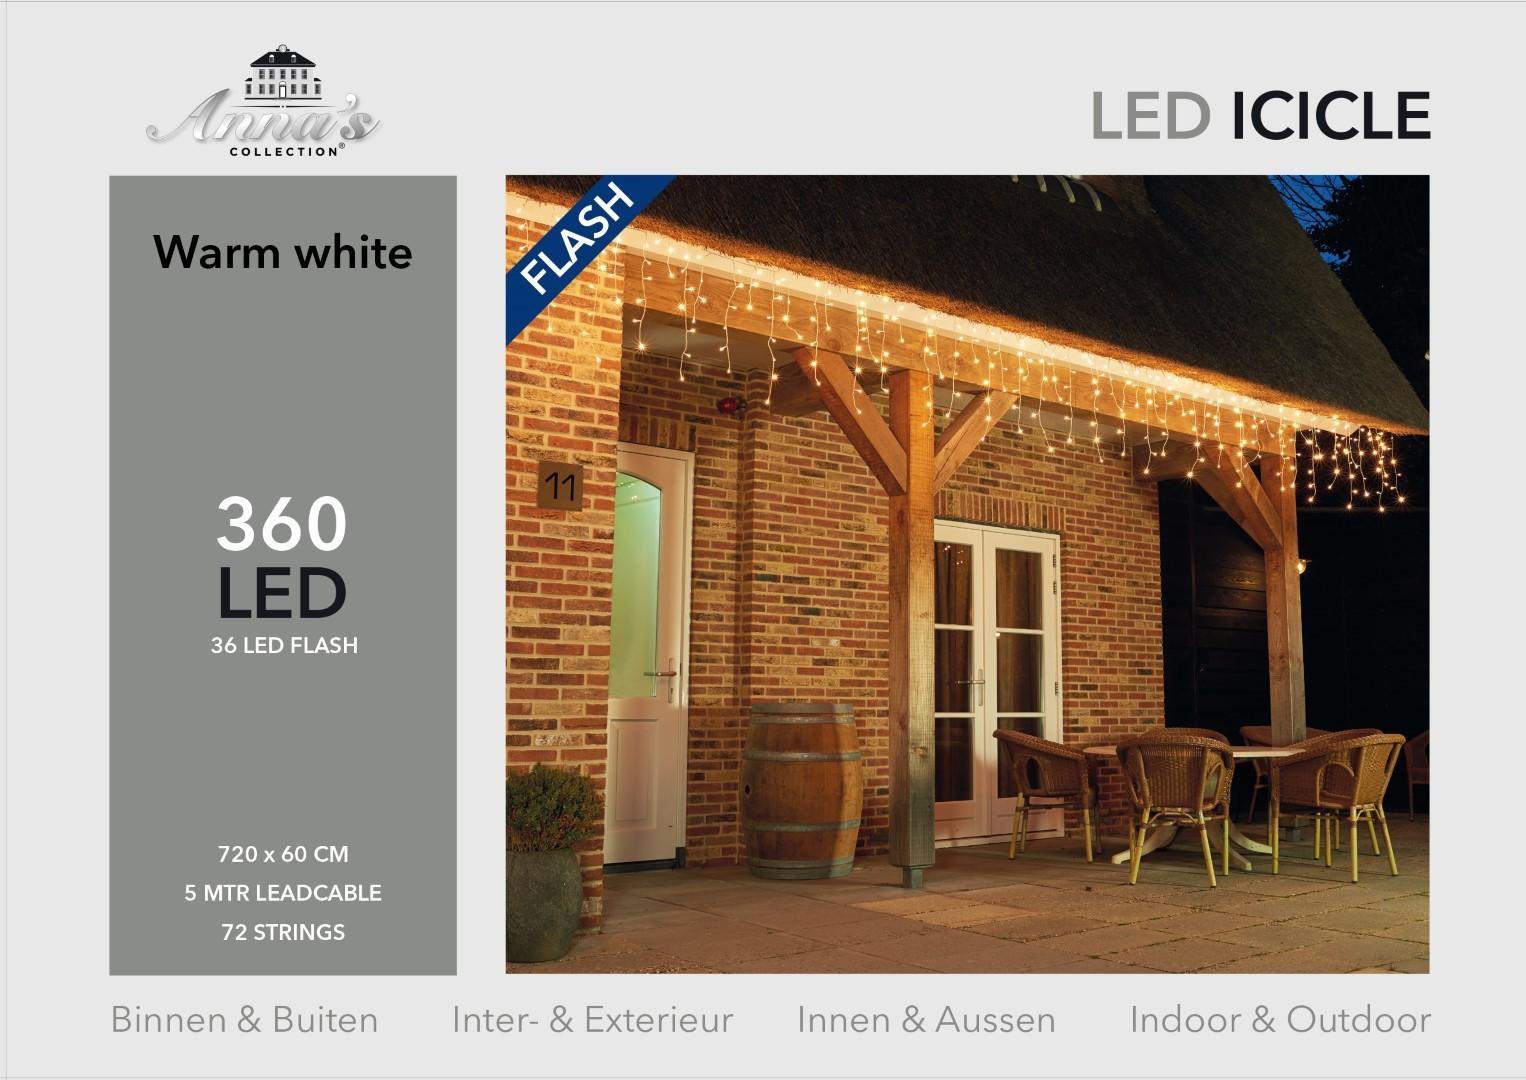 Icicle lights 360l/720x60cm 36l flash led warm wit - 5m aanloopsnoer transparant - 31v/ip44 Anna's c